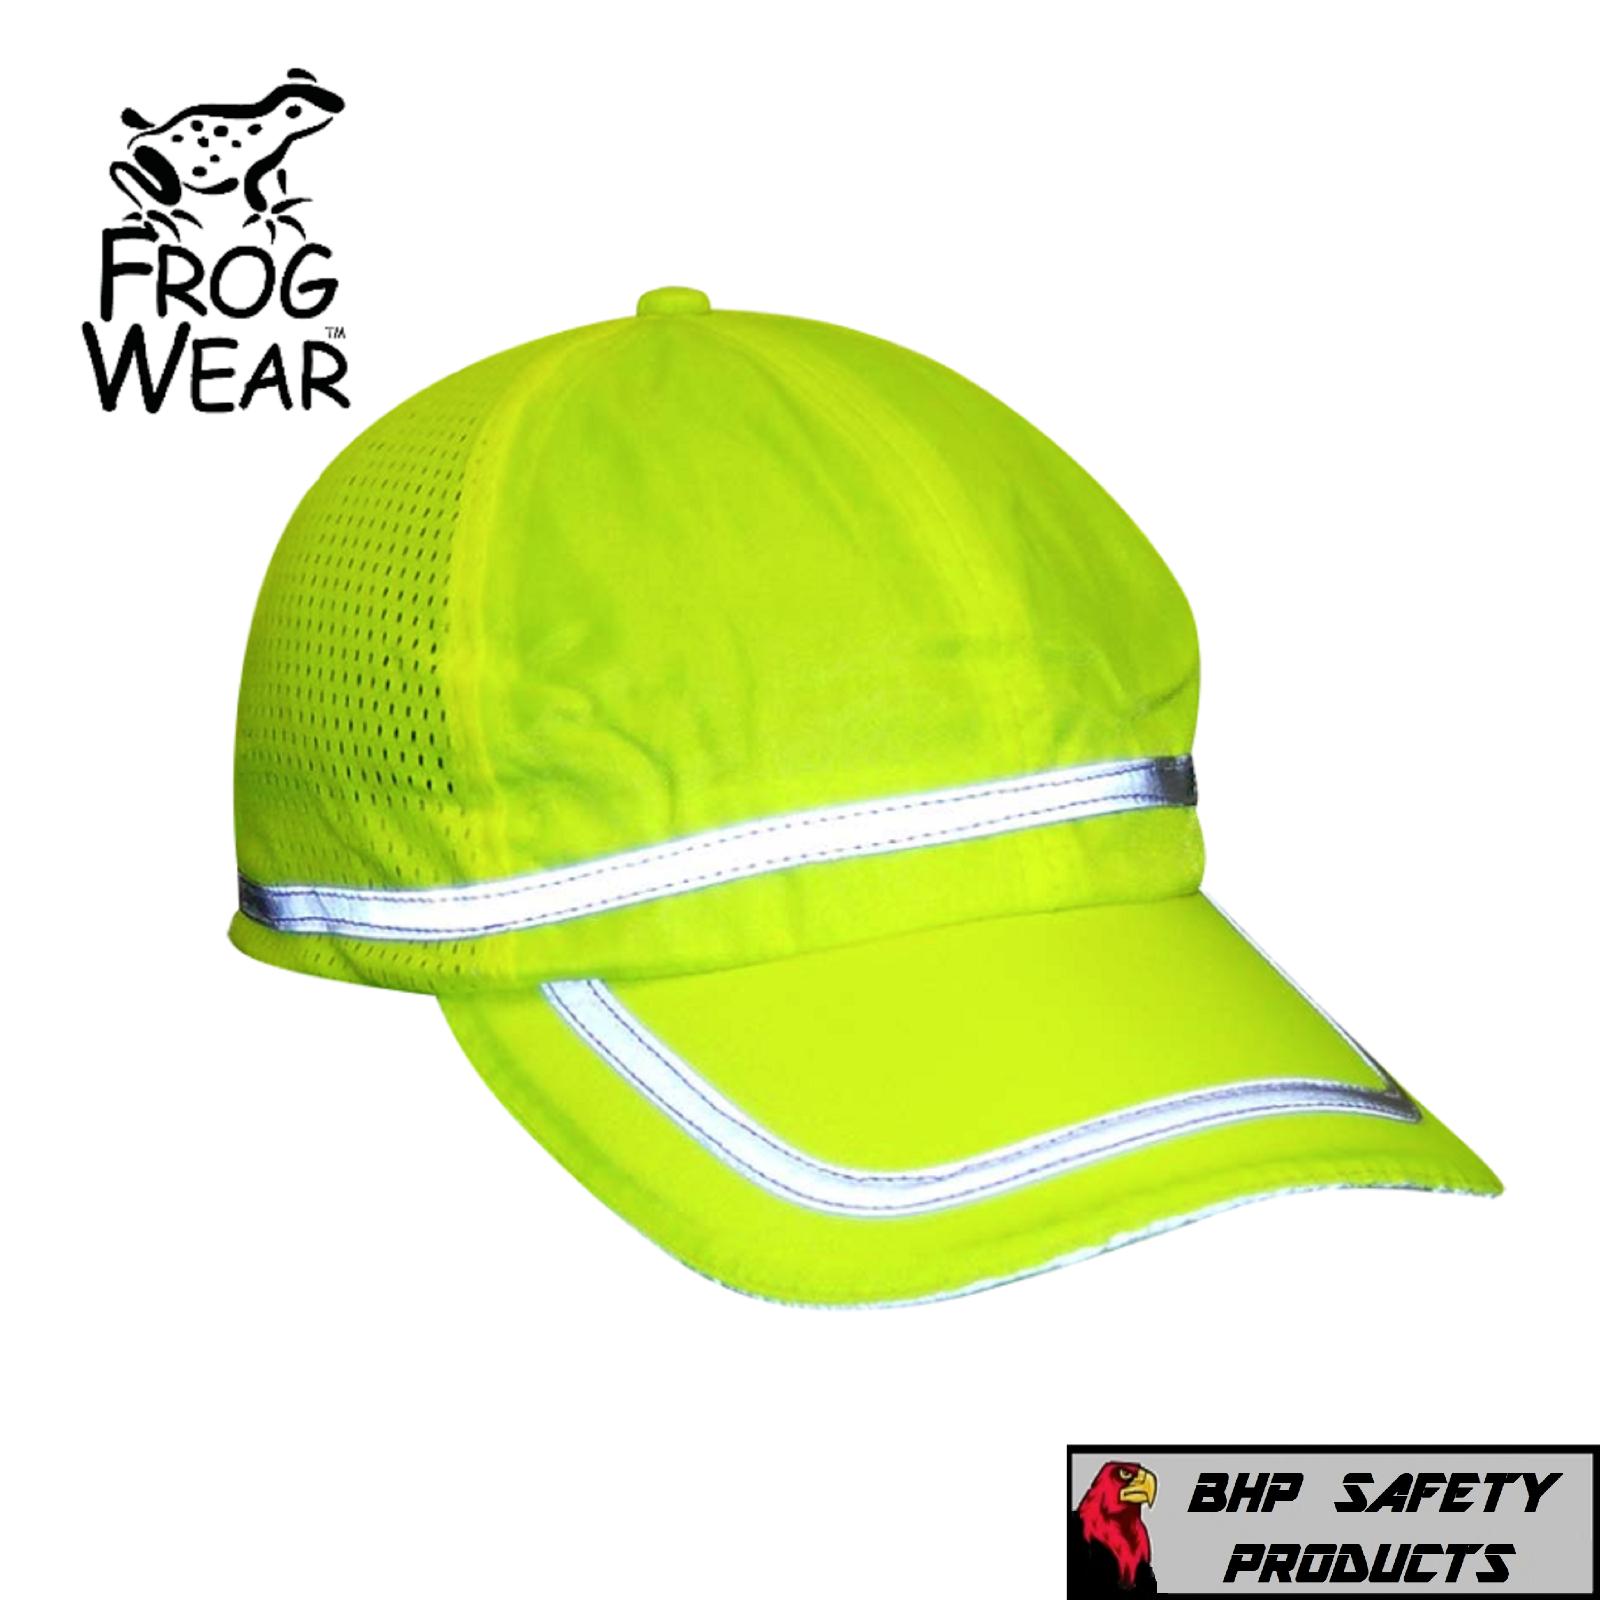 HI-VIS LIME REFLECTIVE HAT/BASEBALL CAP SAFETY, BREATHABLE M